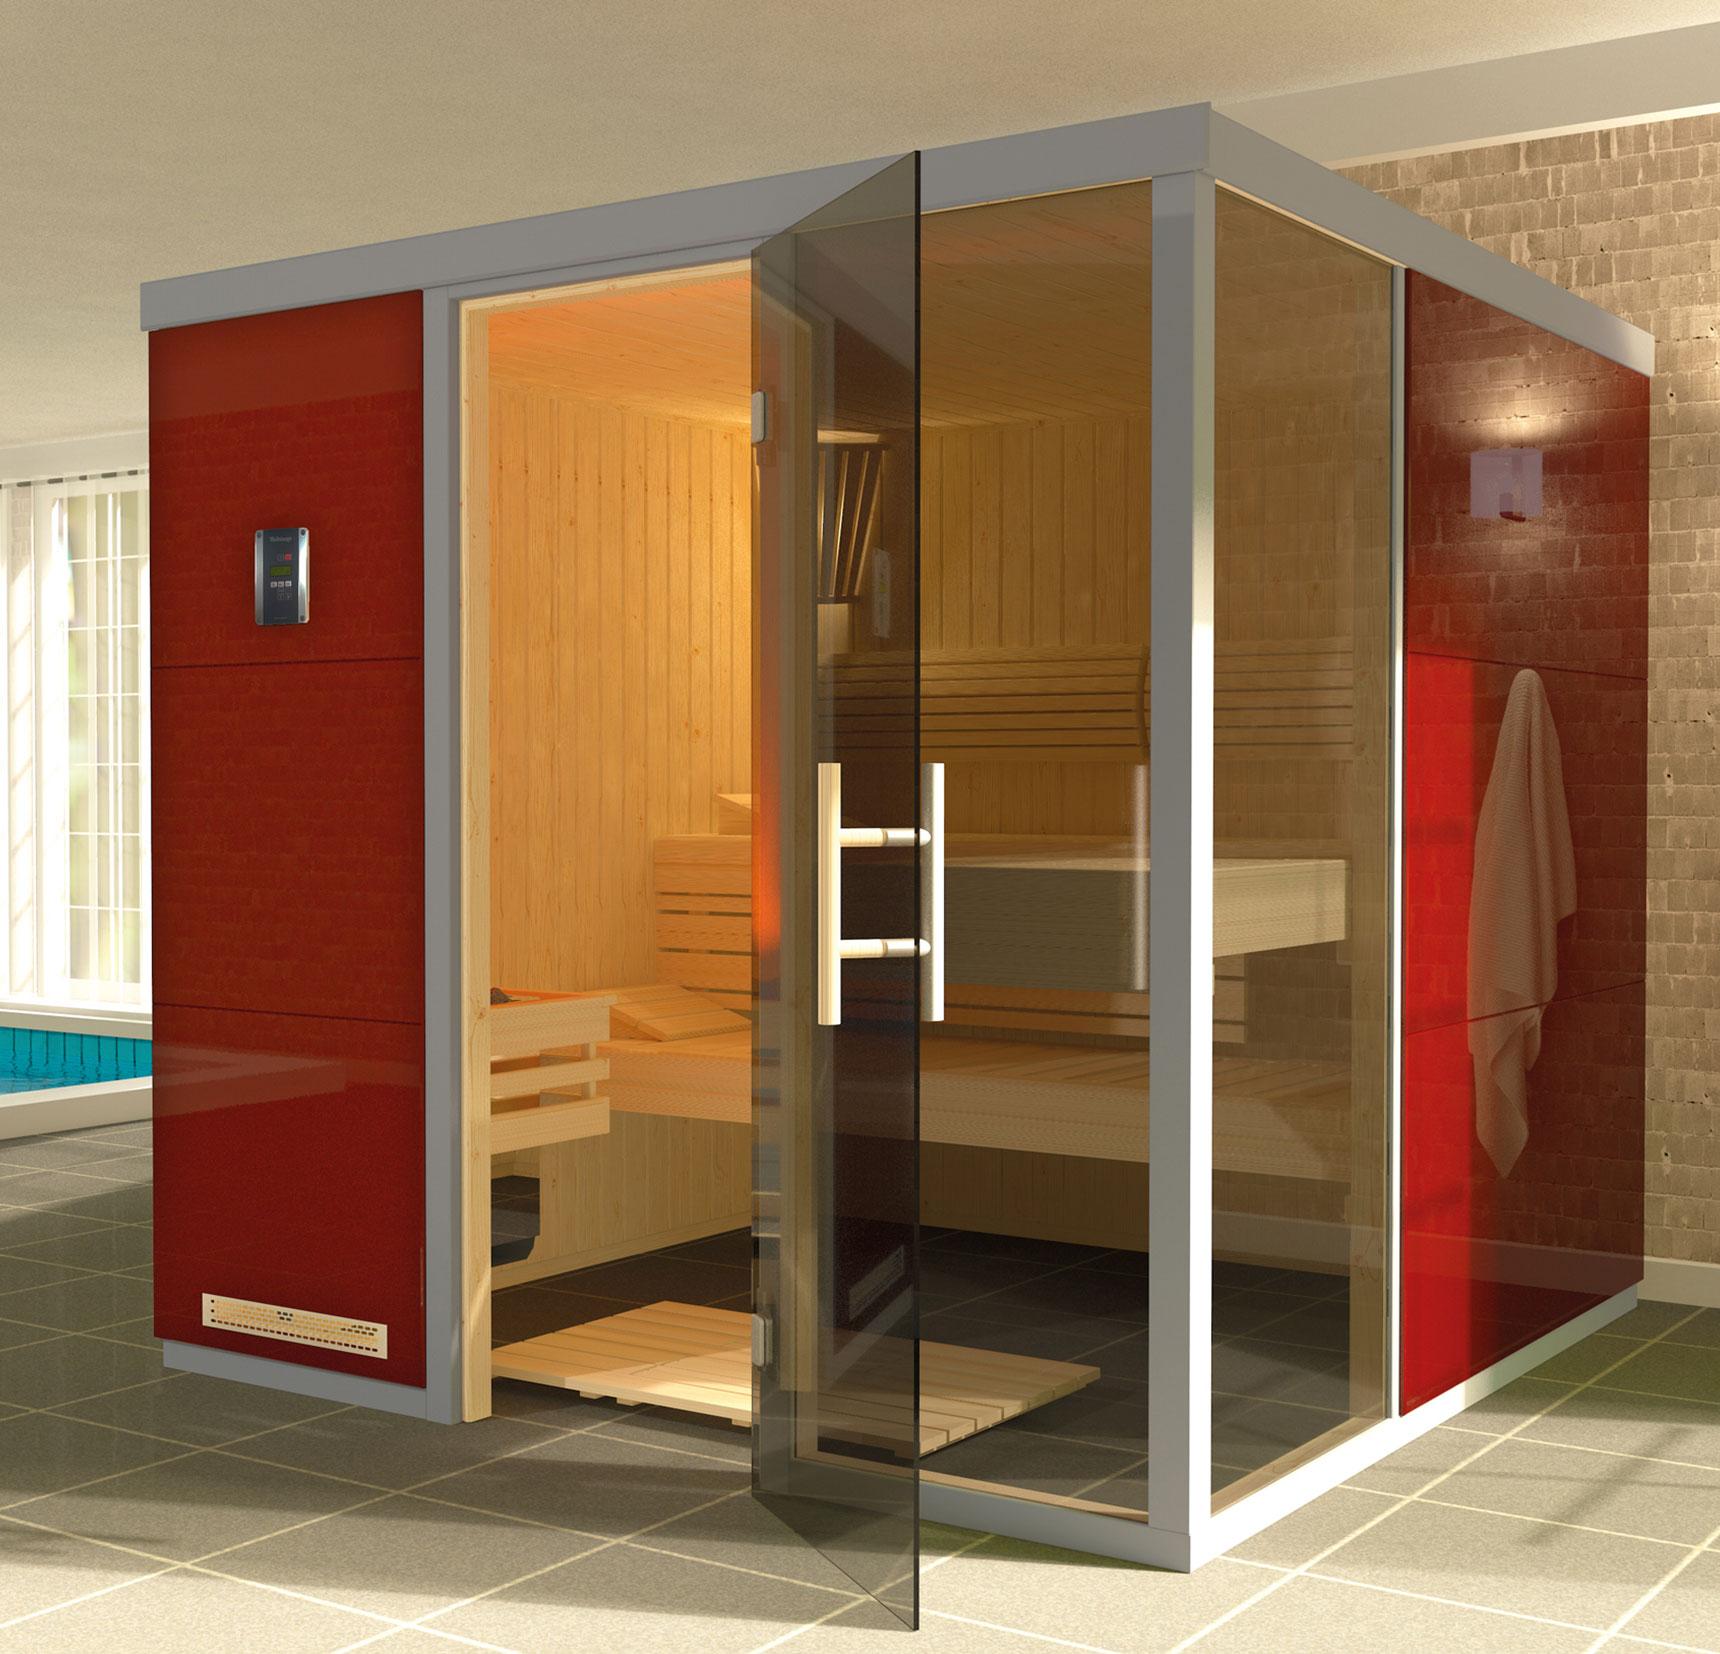 Weka Sauna / Wellnissage Designsauna I R Rosso 68mm ohne Saunaofen Bild 1